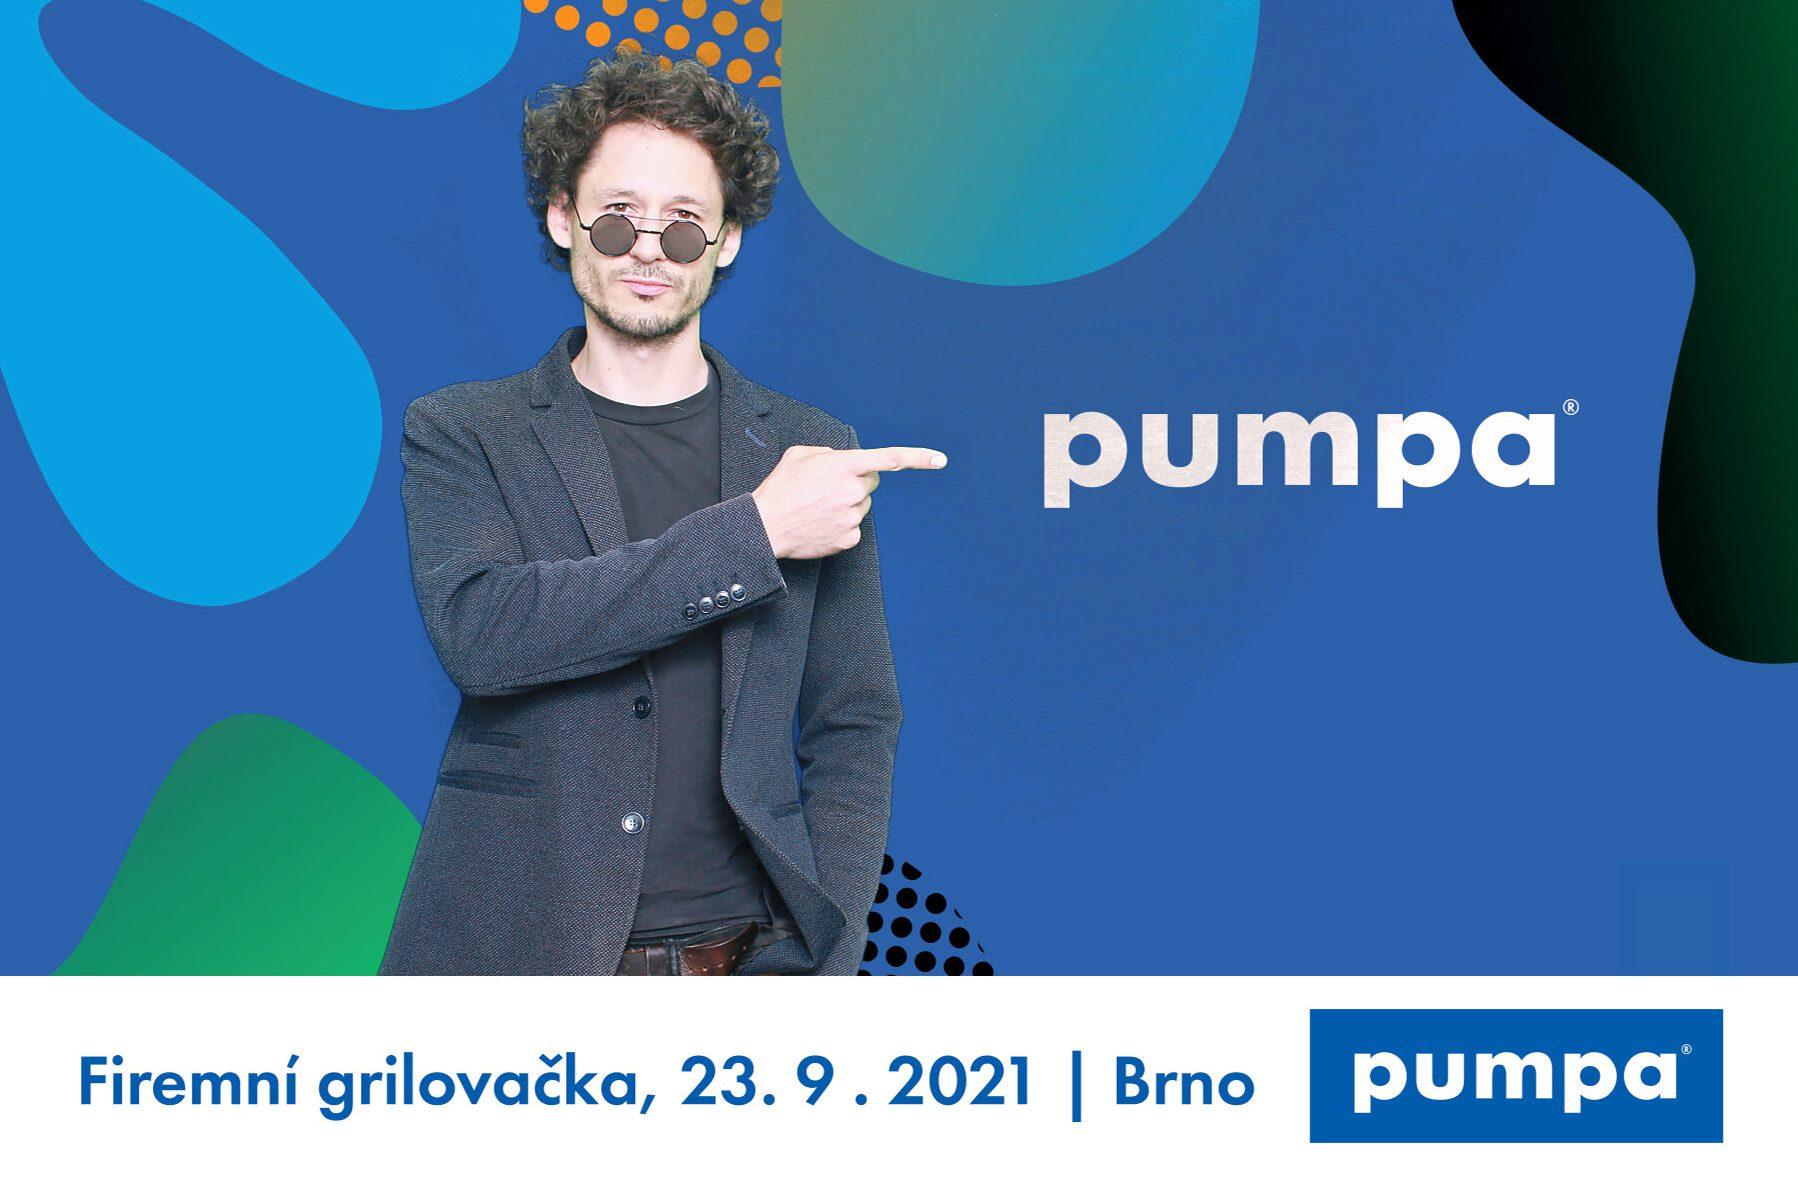 fotokoutek-brno-firemni-vecirek-pumpa-23-9-2021-753926